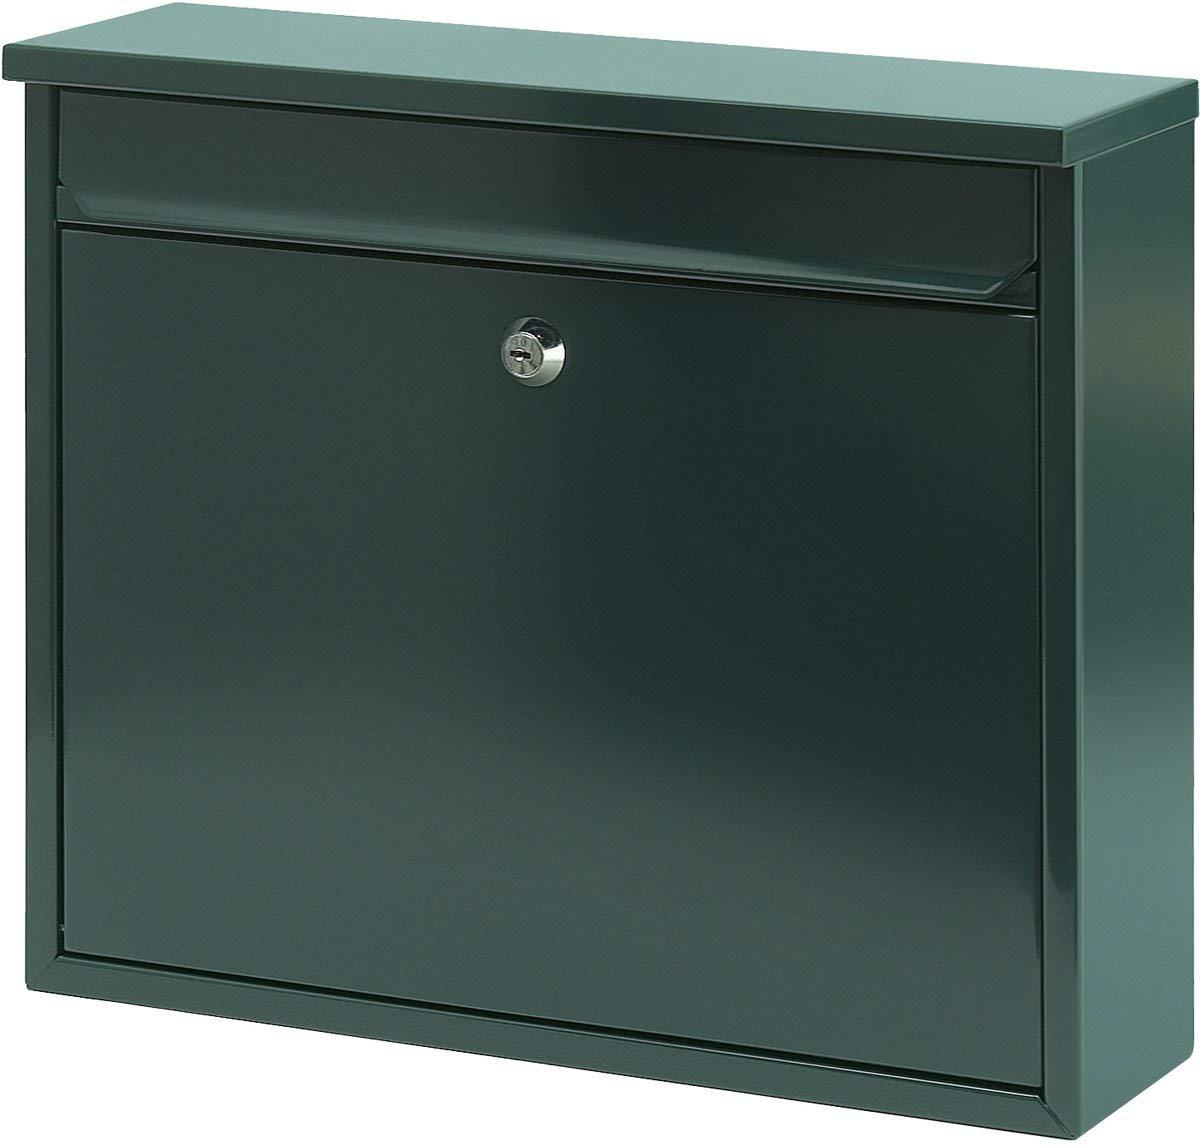 Buz/ón color V-Part VB 440160 verde